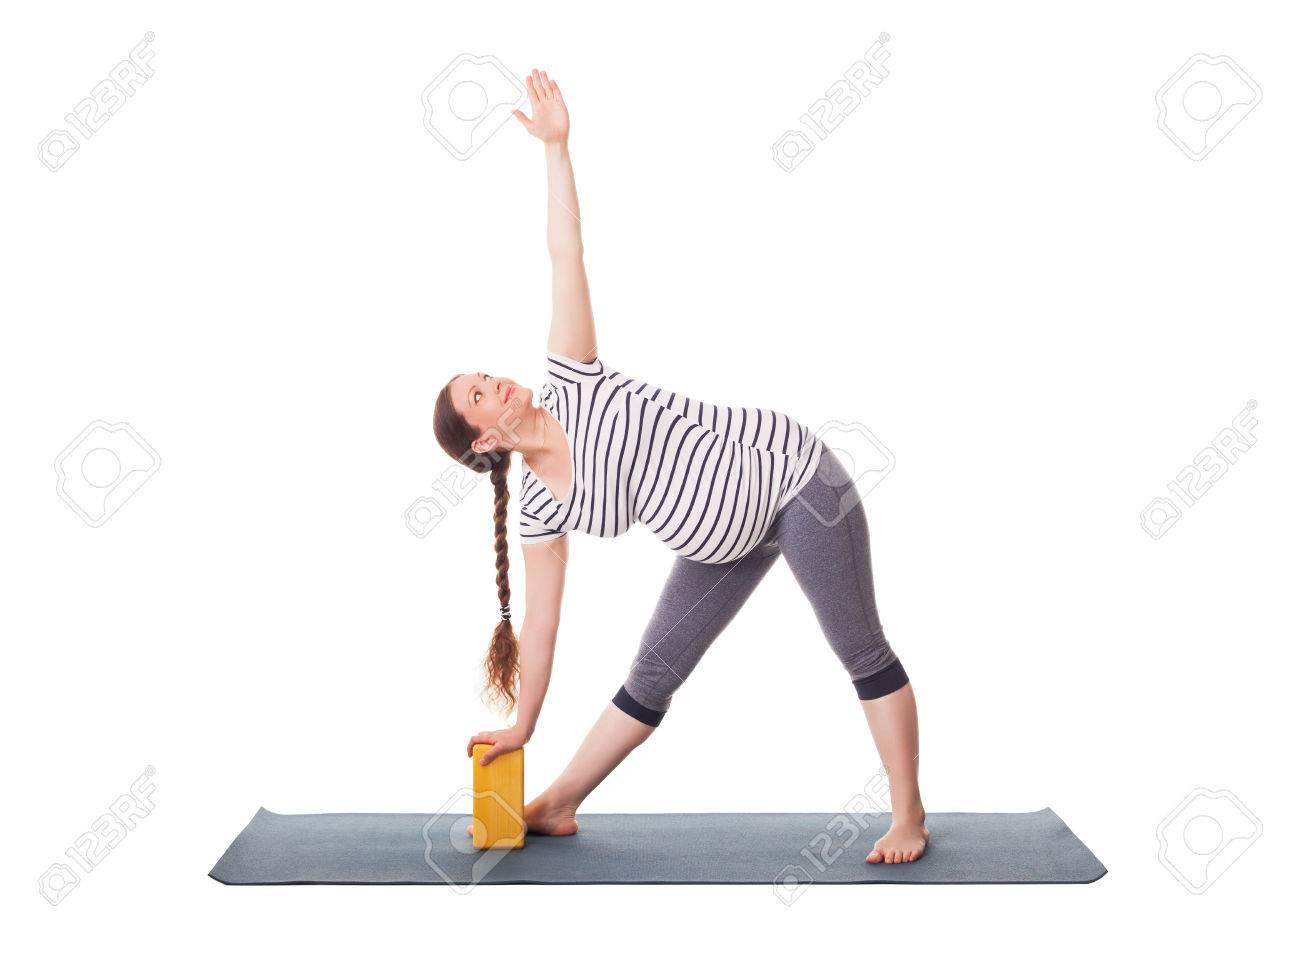 Pregnancy yoga exercise - pregnant woman doing asana Utthita trikonasana - extended triangle pose with block isolated on white background - 60025703